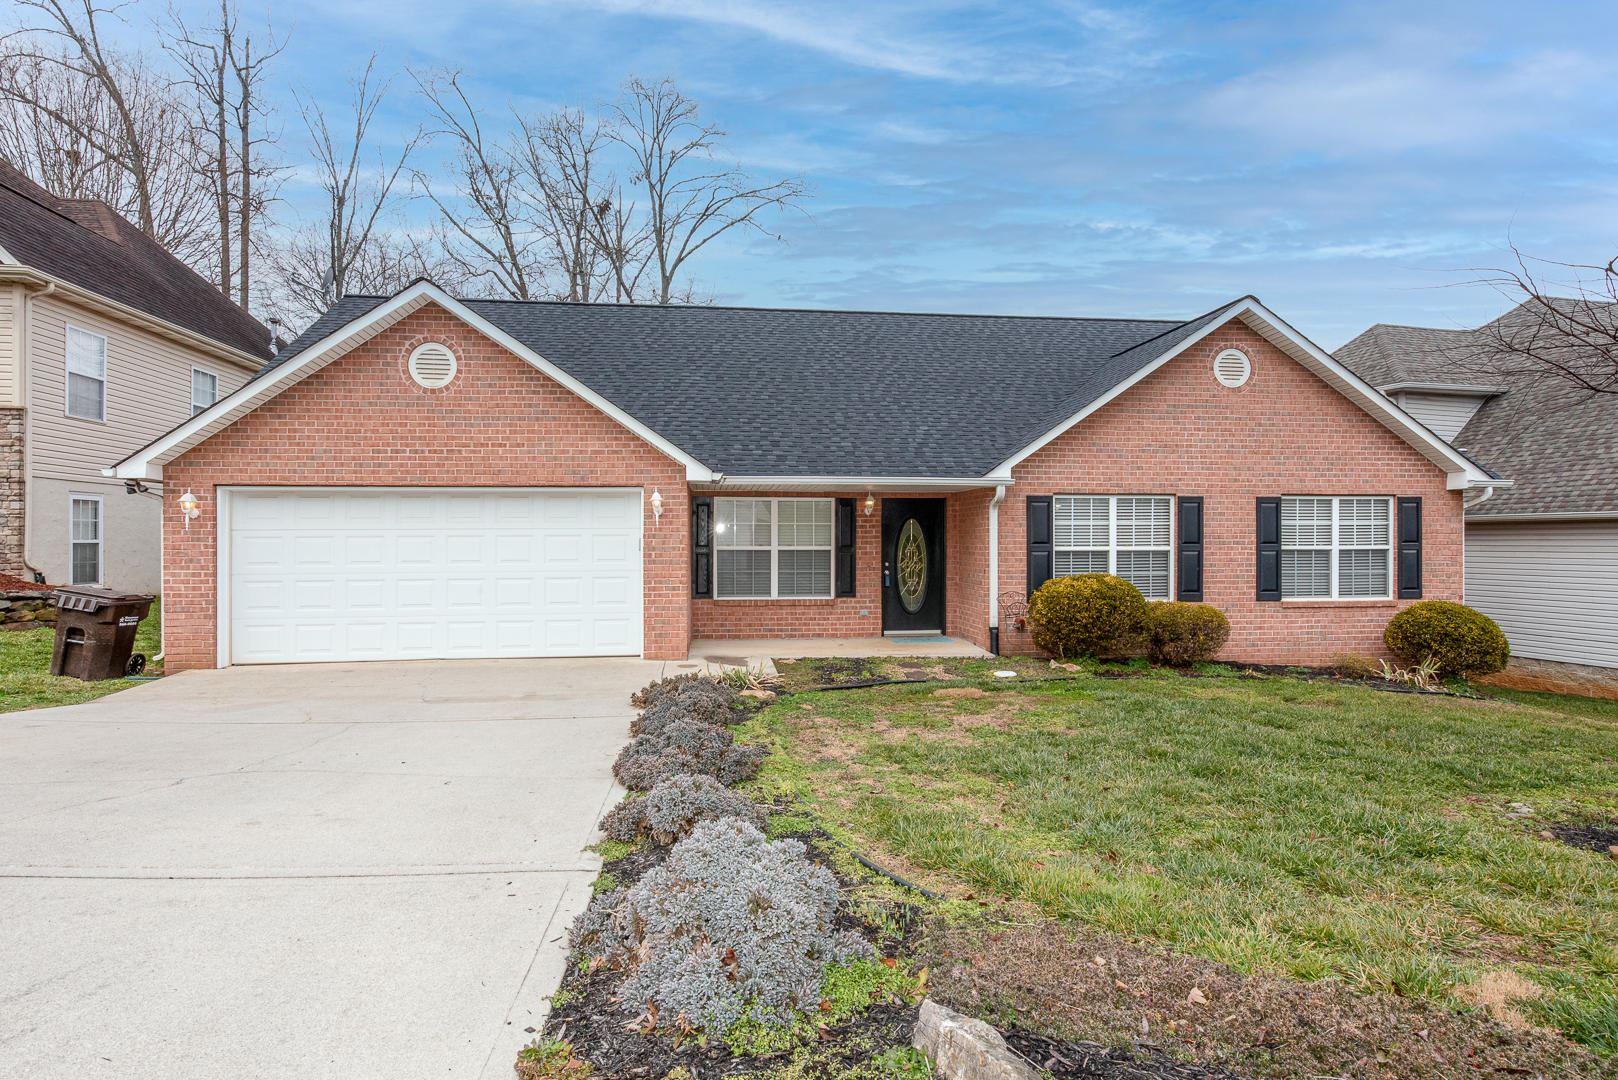 Photo of 11029 Eagle Creek Lane, Knoxville, TN 37932 (MLS # 1140203)